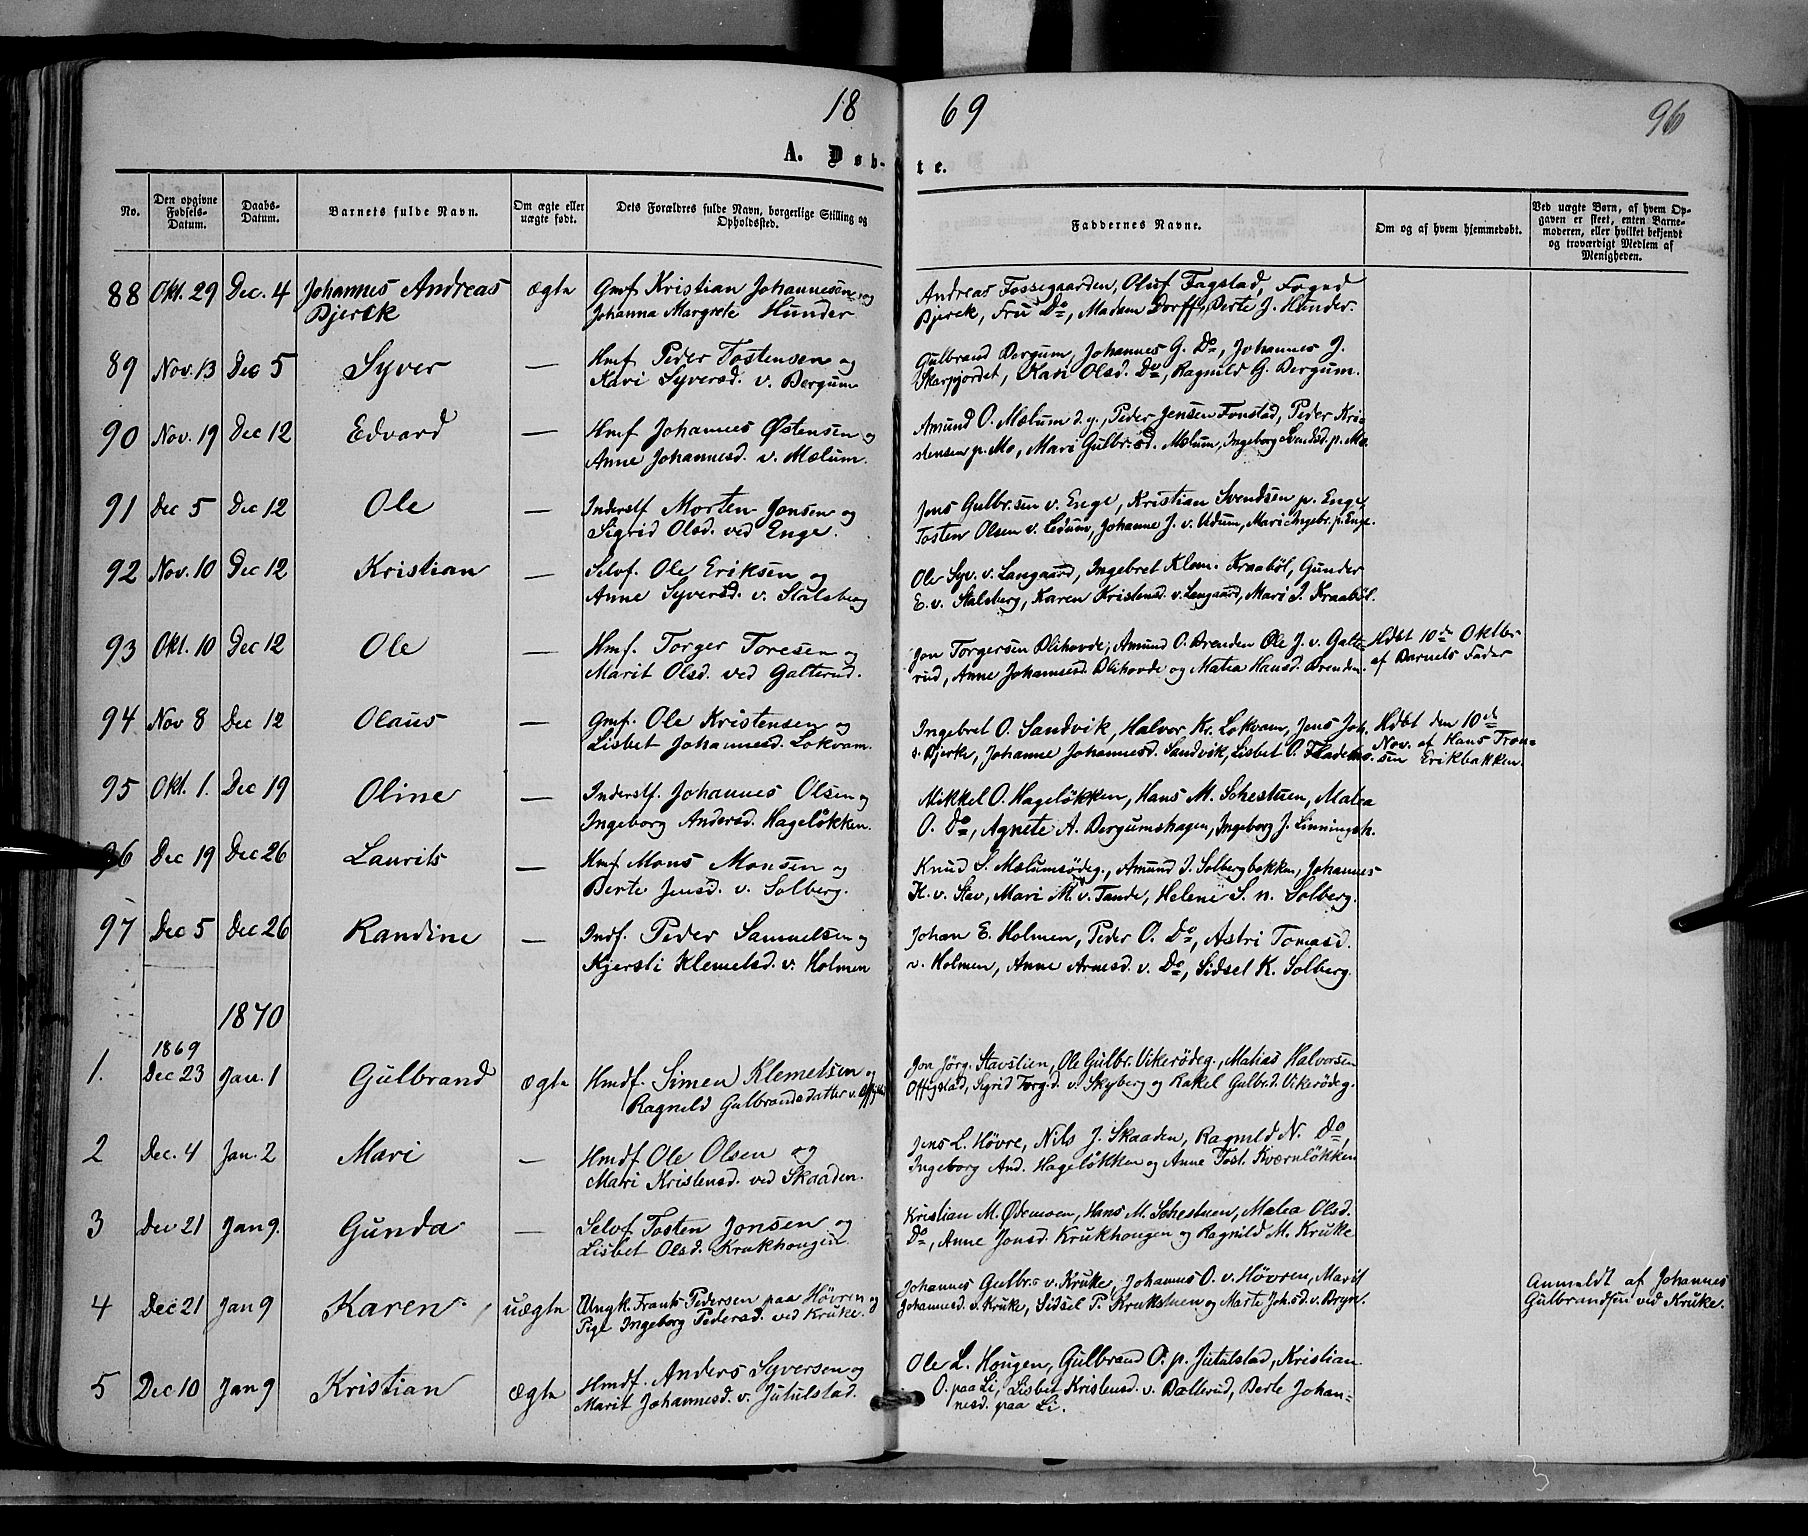 SAH, Øyer prestekontor, Ministerialbok nr. 6, 1858-1874, s. 96